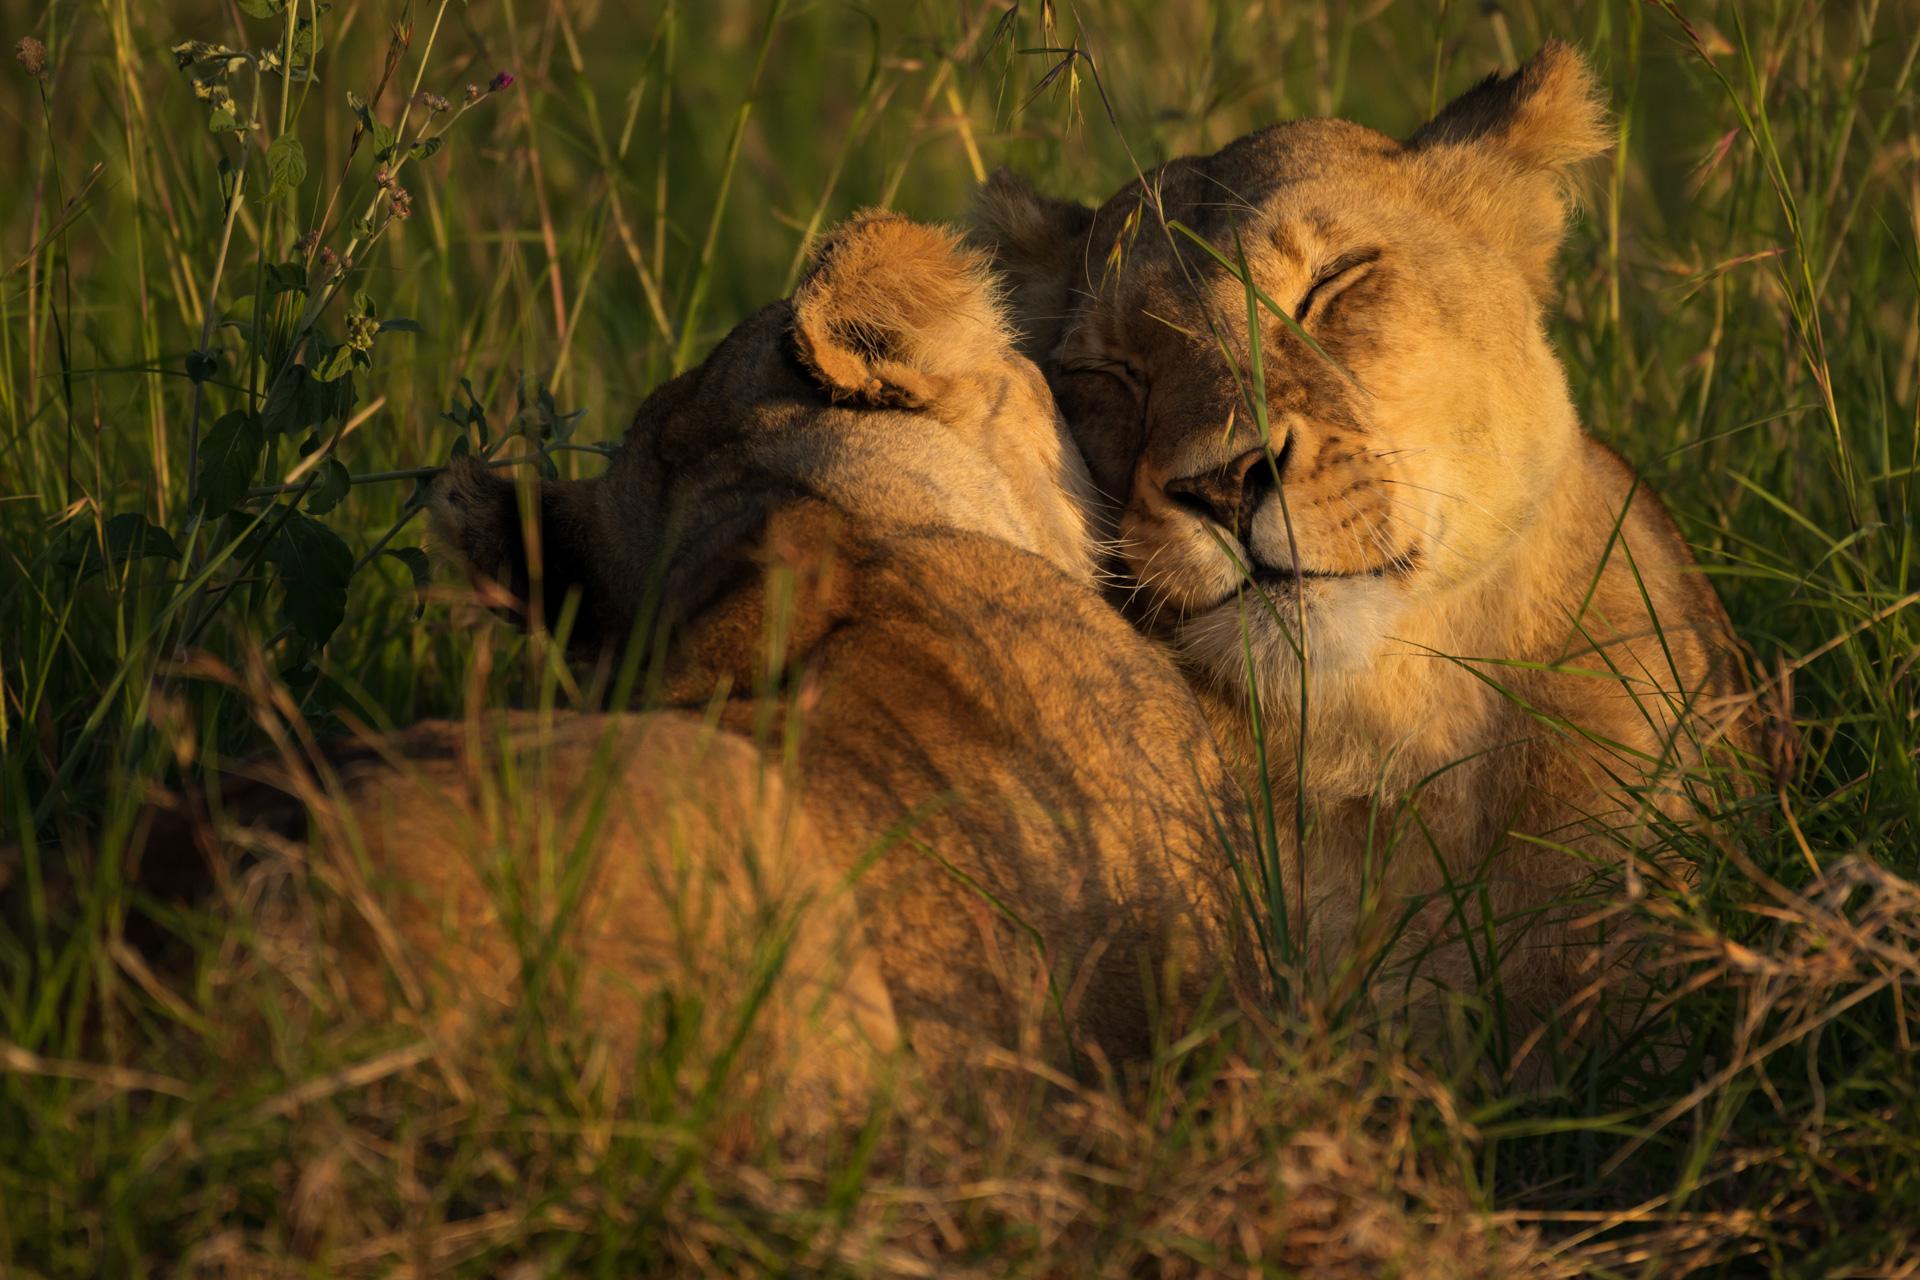 Lions cuddling